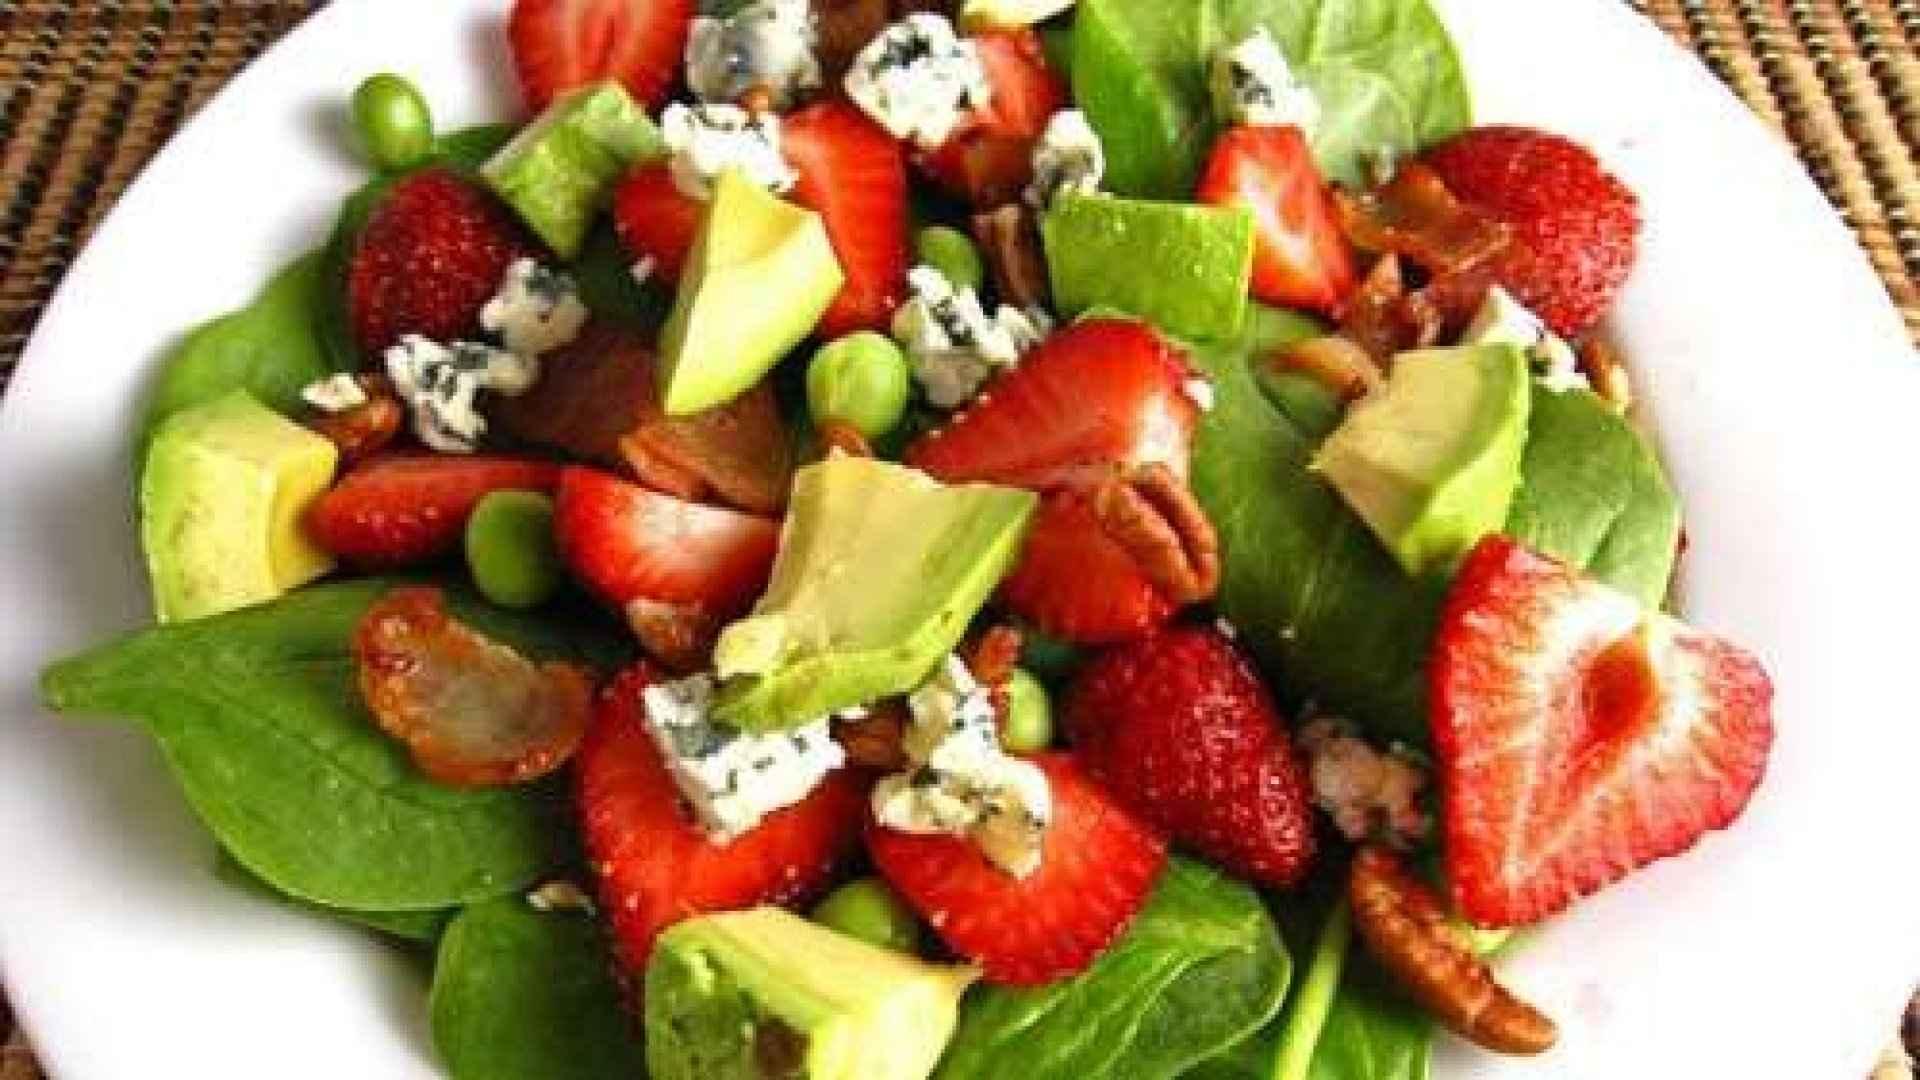 Strawberry, spinach and avocado salad with honey vinaigrette